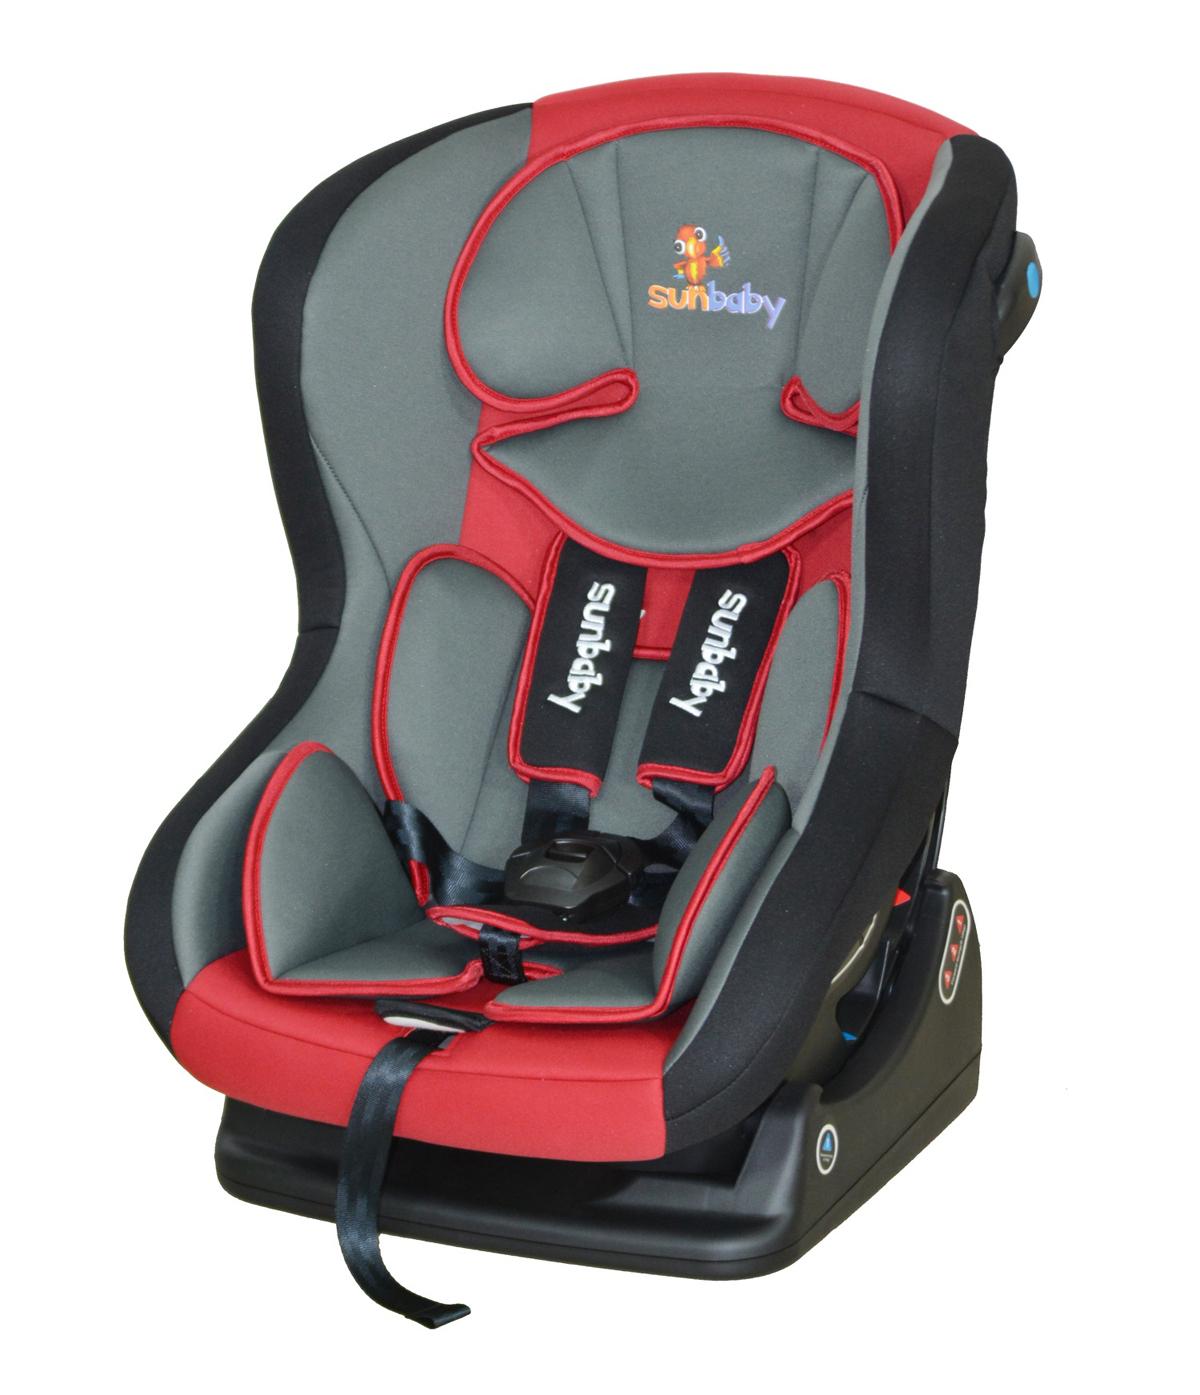 sunbaby car seat - baby car seat outdoor products sunbaby sunbaby sunbaby recliningcarseatred with grey